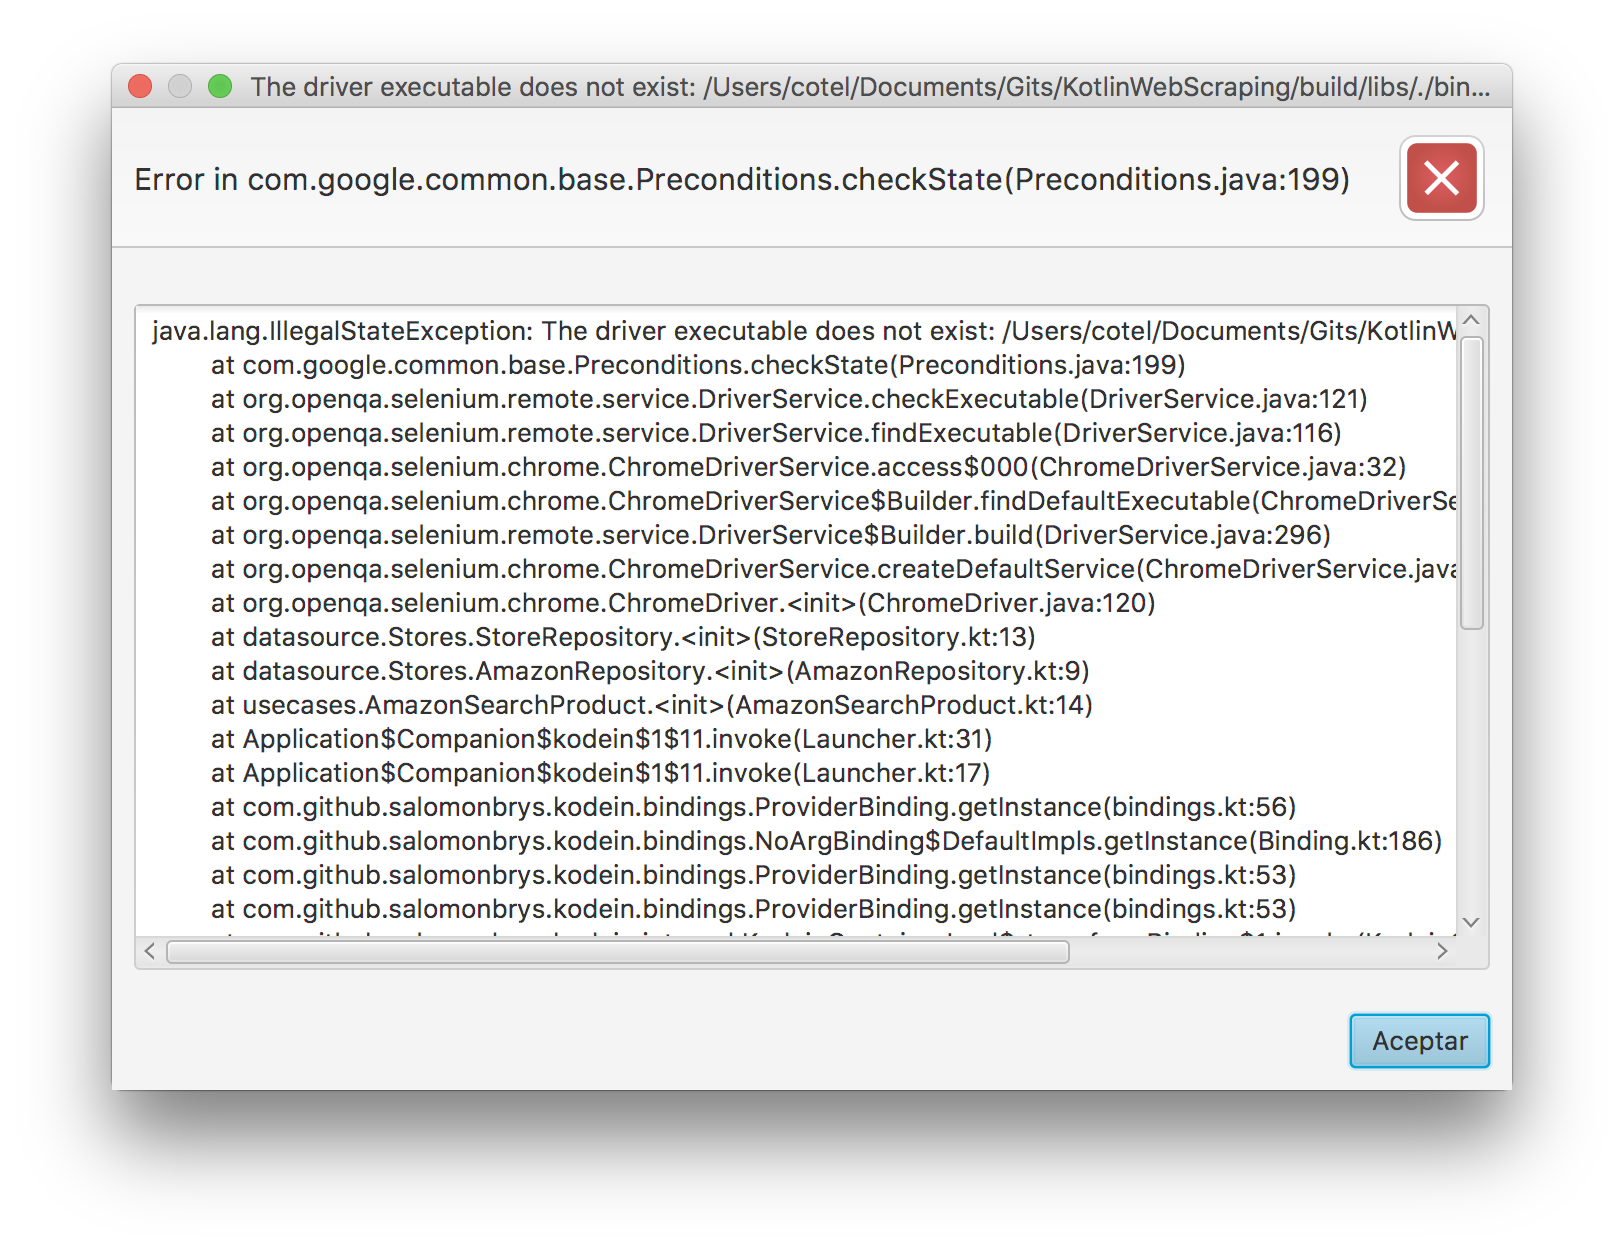 GitHub - ConradoMateu/KotlinWebScraping: Kotlin Web Scraping